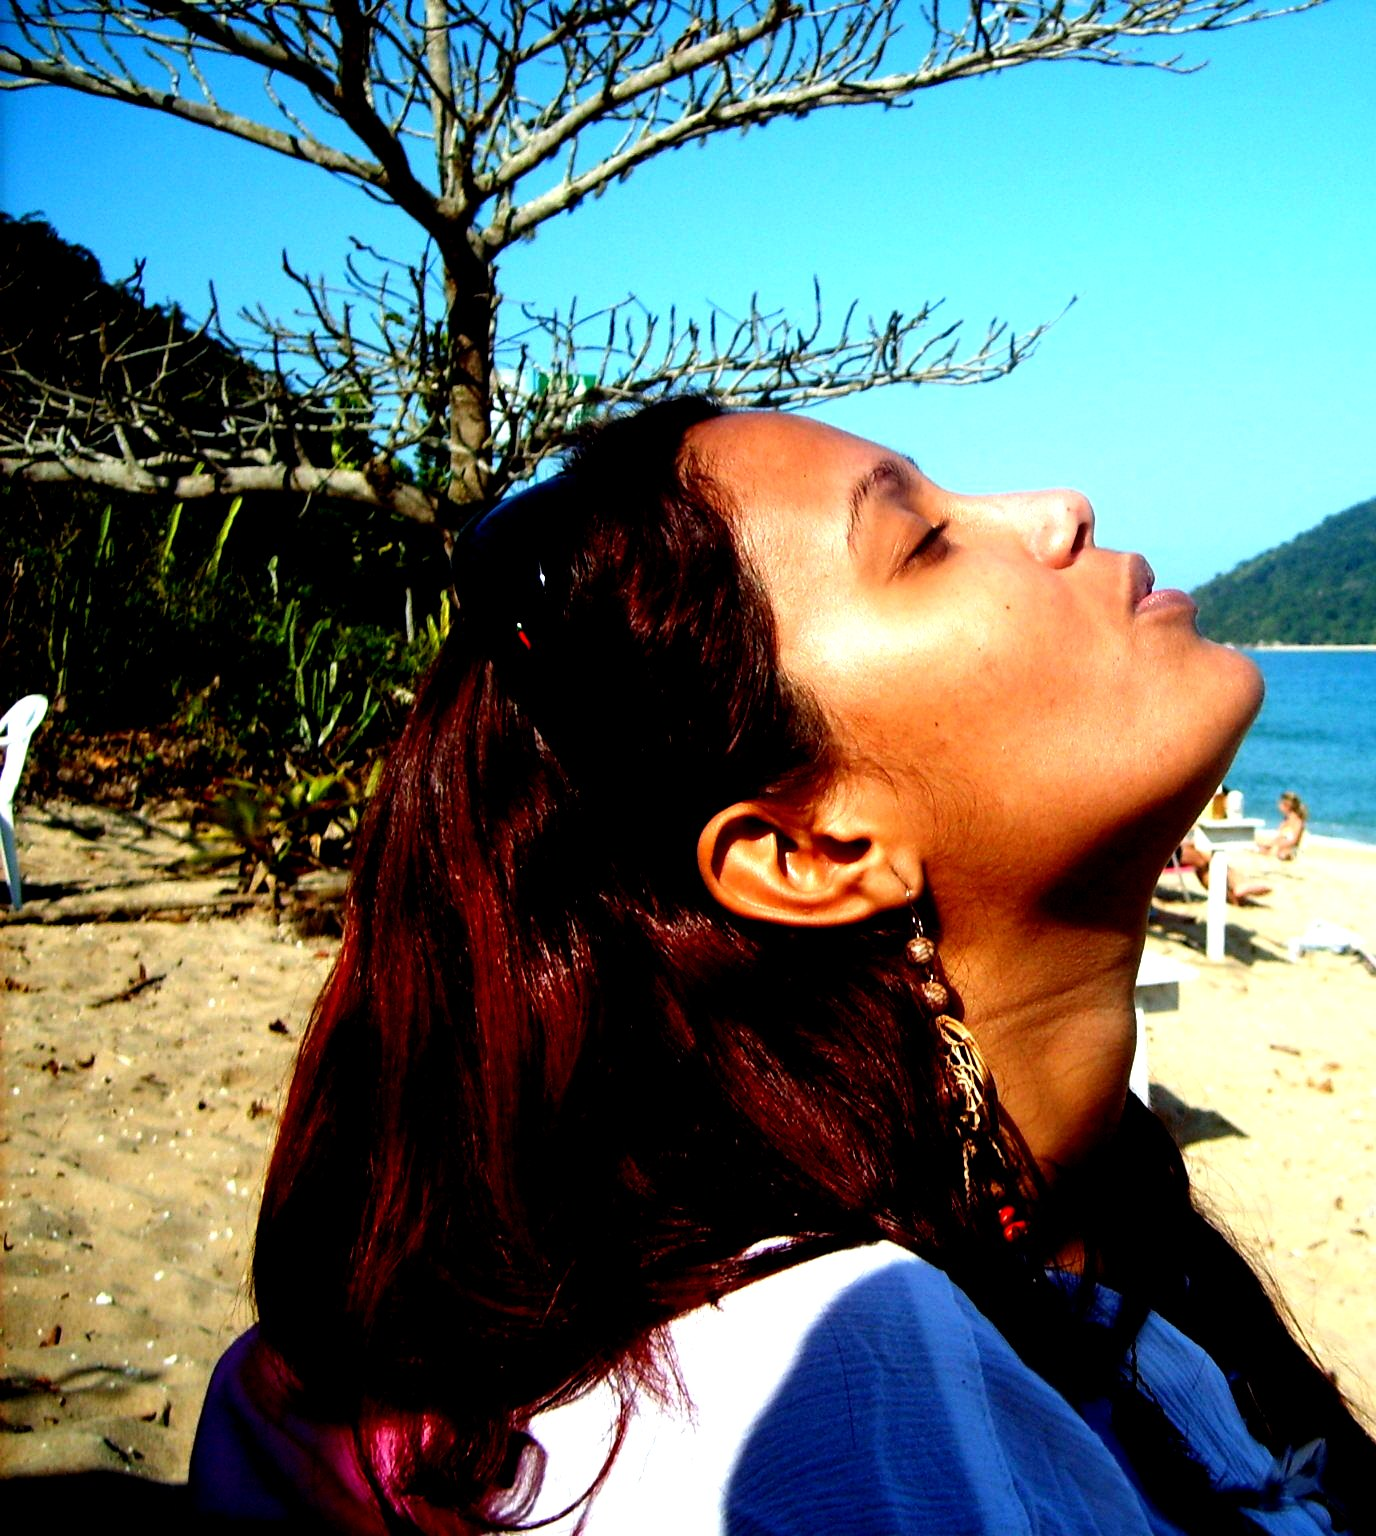 http://1.bp.blogspot.com/-WOp3Q2aGvVA/TdgW5FL59UI/AAAAAAAAATU/PCJf-a6-3-4/s1600/praia+e+festa+101-.jpg